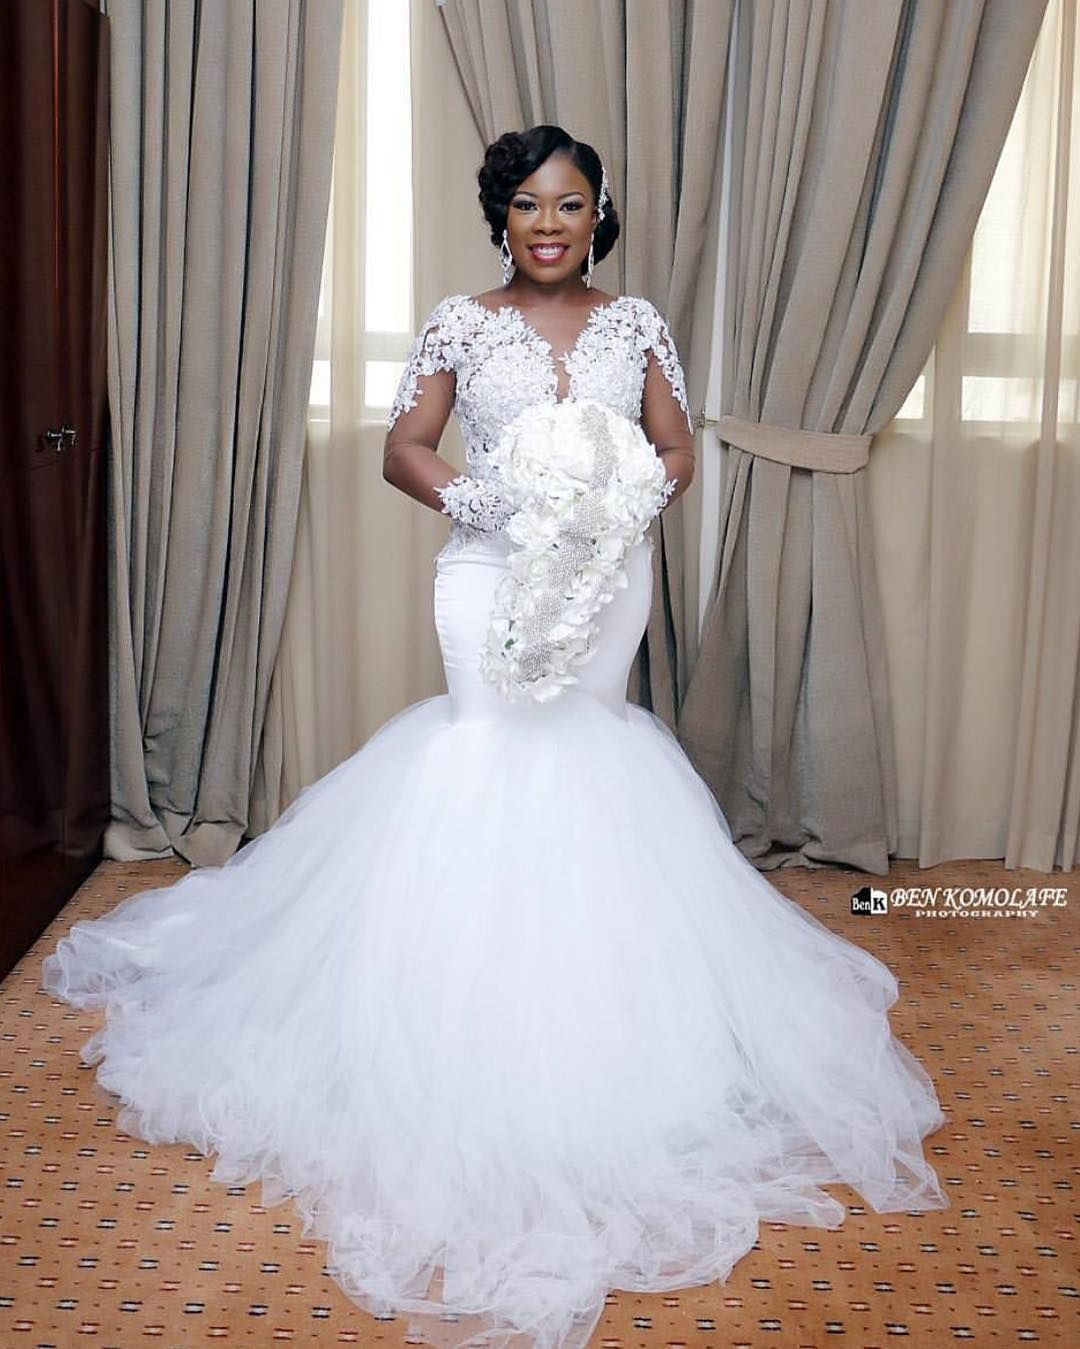 A Prettyperfect Regram From Benkomolafephotography Love The Bride S Weddingdress By